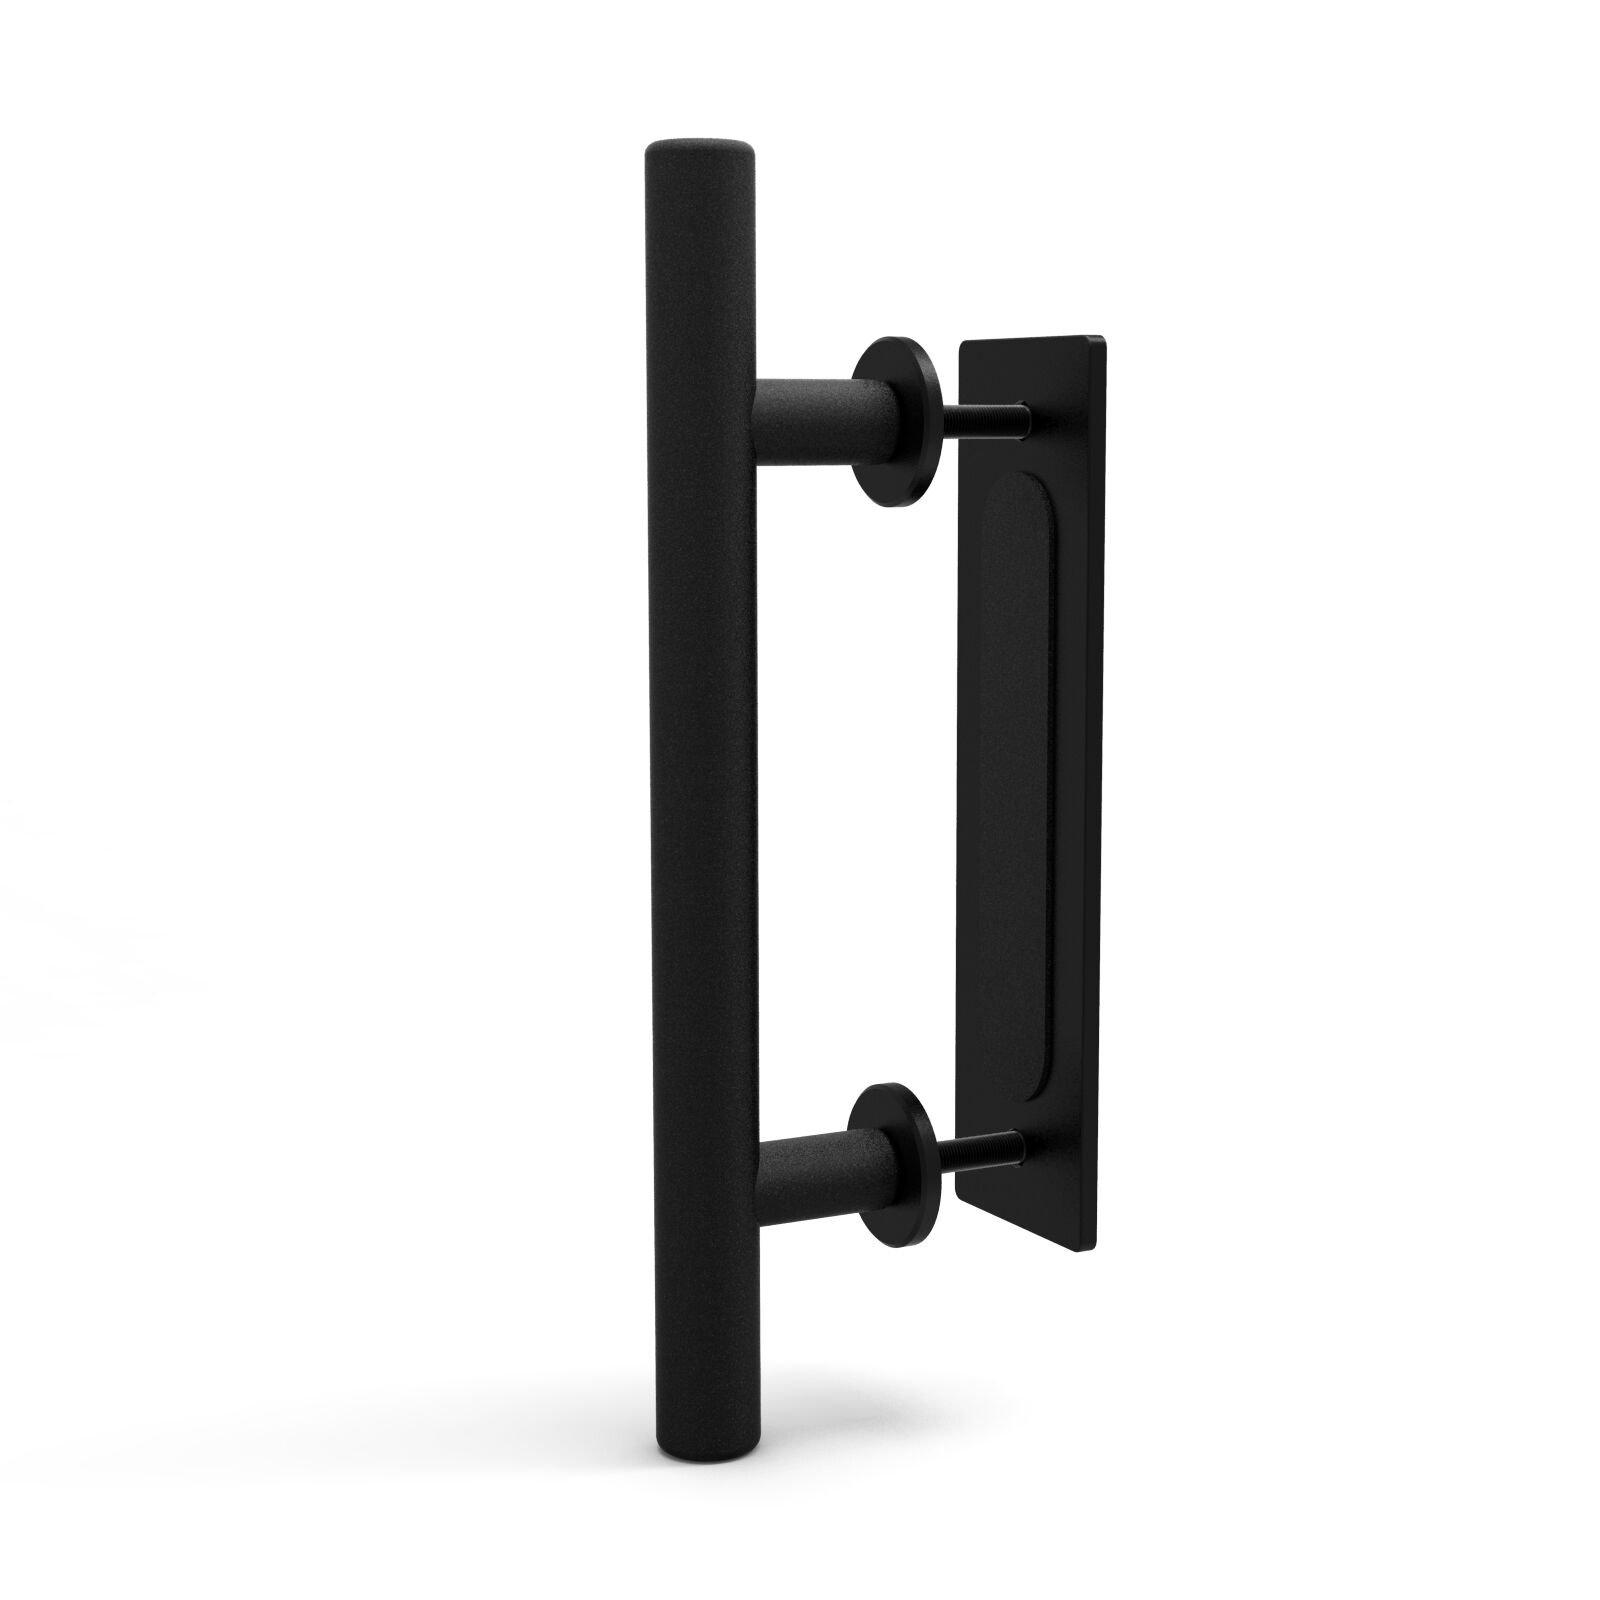 CCJH 12'' Pull and Flush Door Handle Set for Sliding Wooden Hardware Gate Doors Black